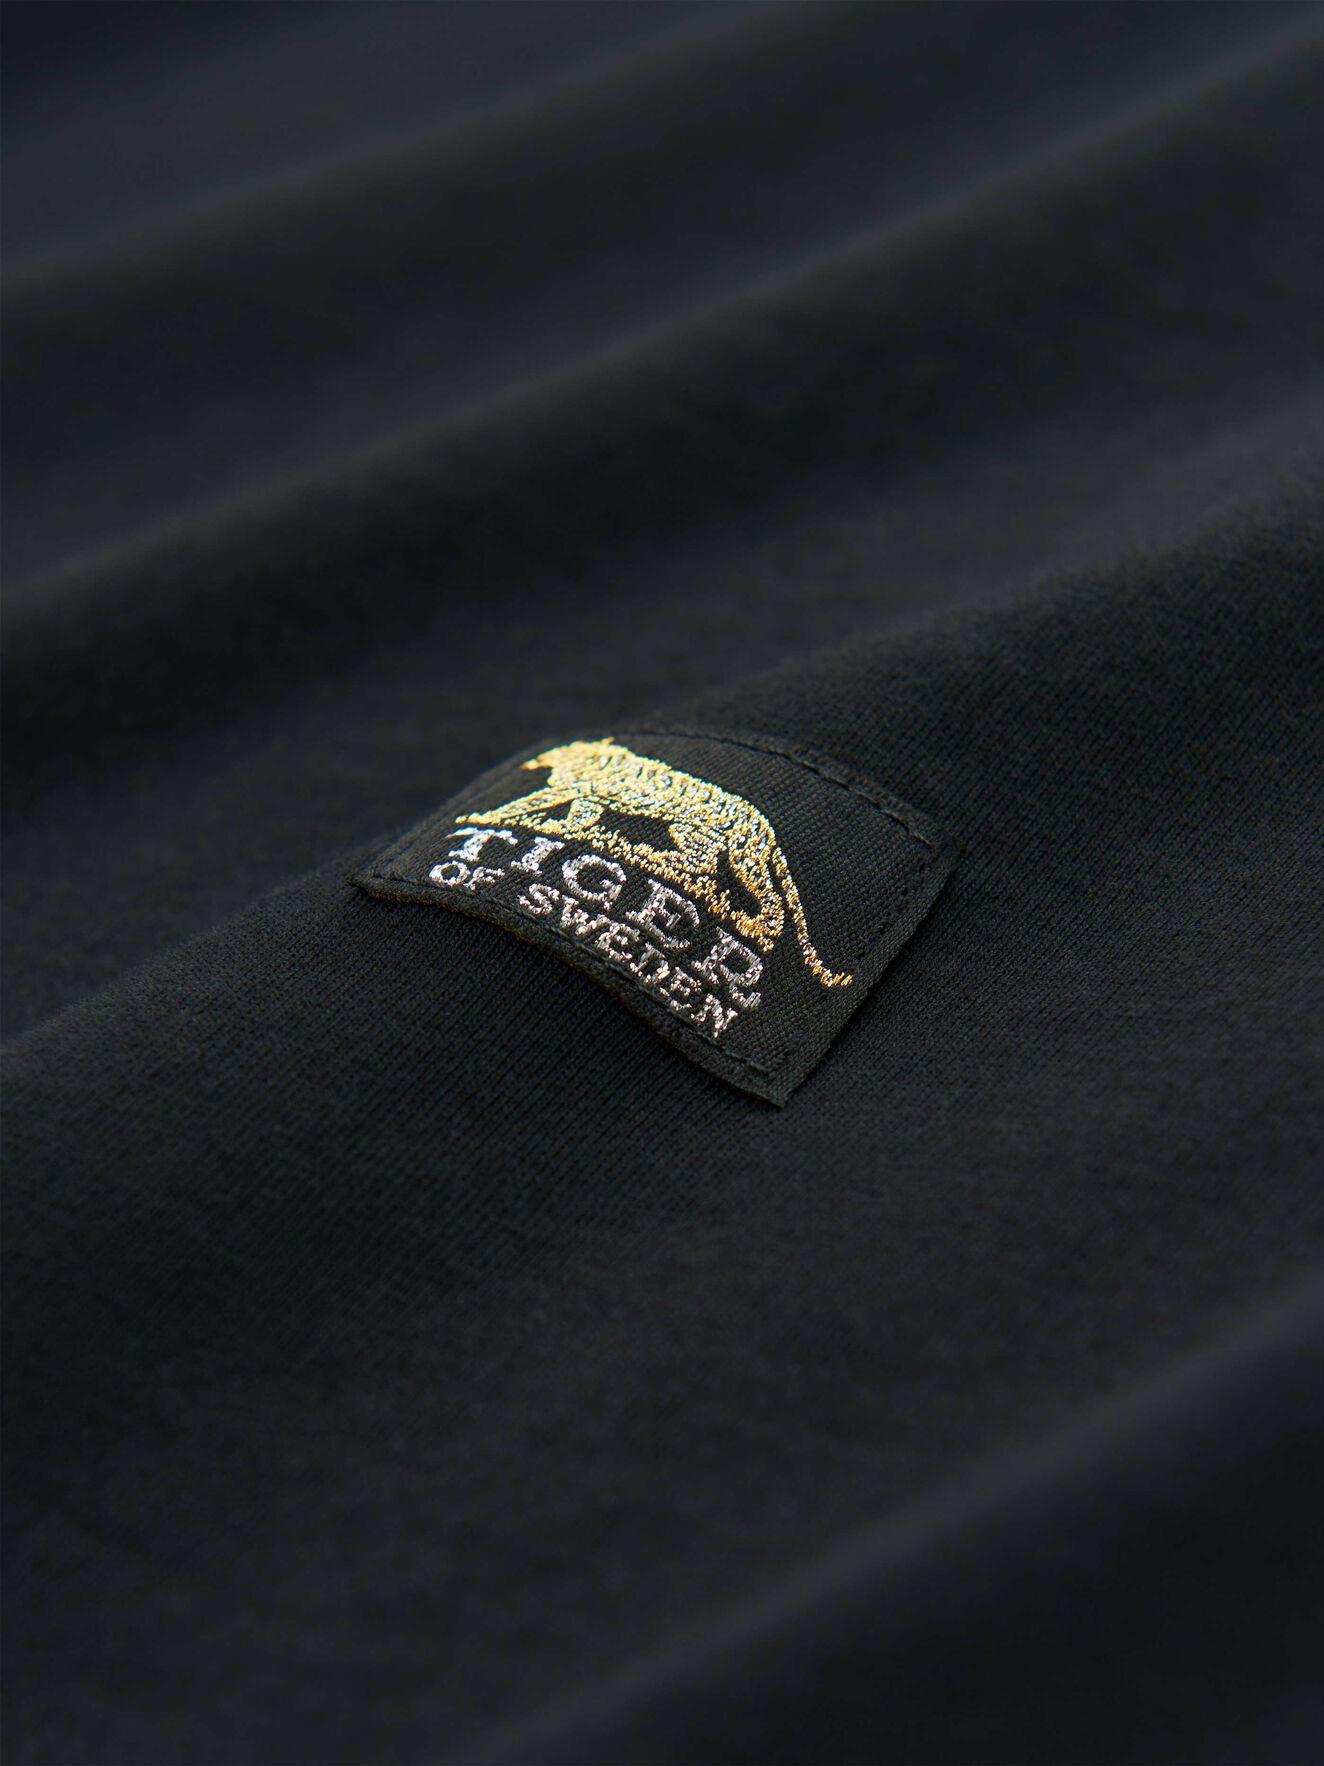 Dellana T-Shirt in Midnight Black from Tiger of Sweden